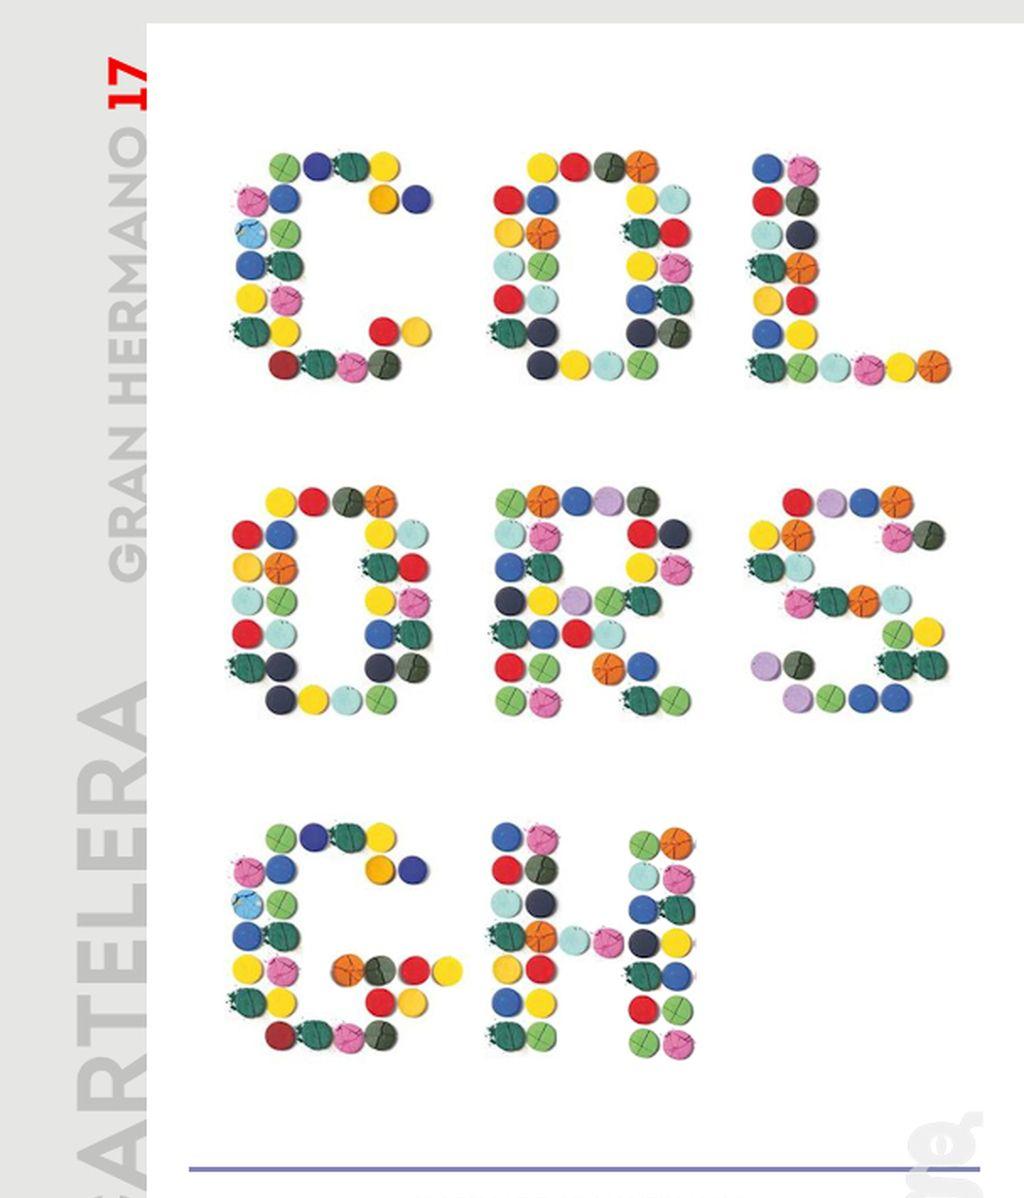 Cartelera: Colors GH